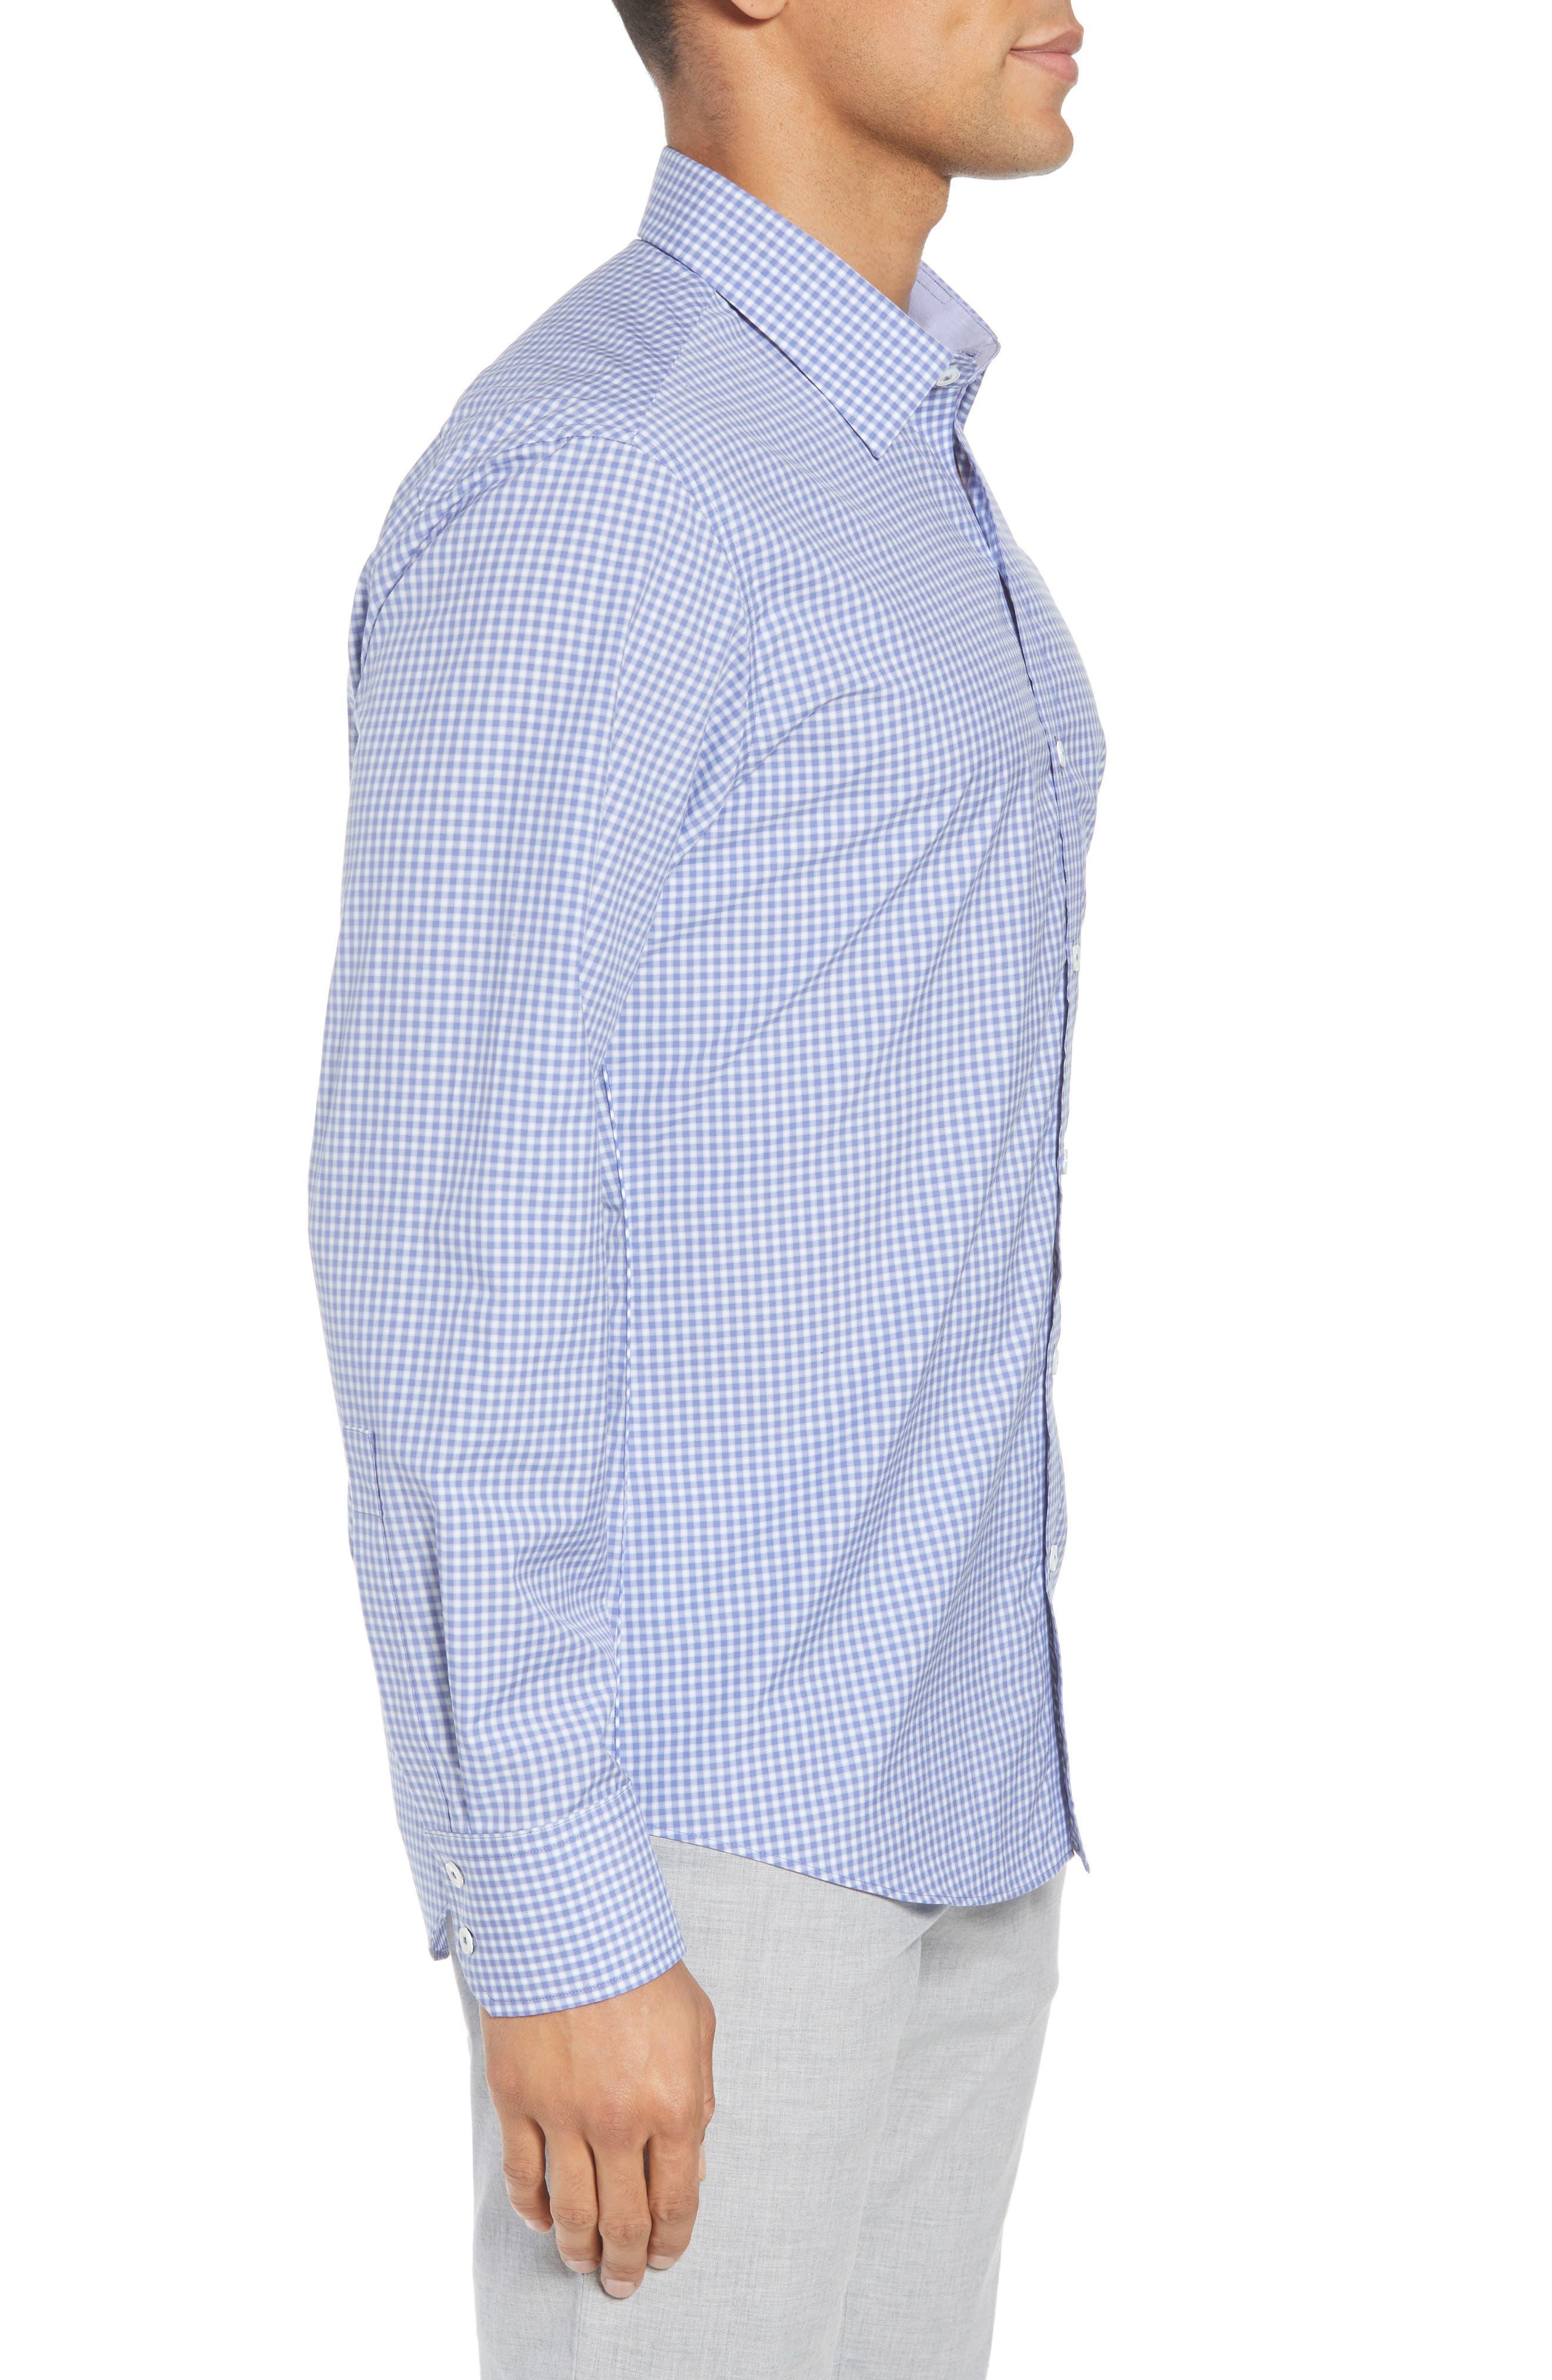 Winston Regular Fit Sport Shirt,                             Alternate thumbnail 3, color,                             422